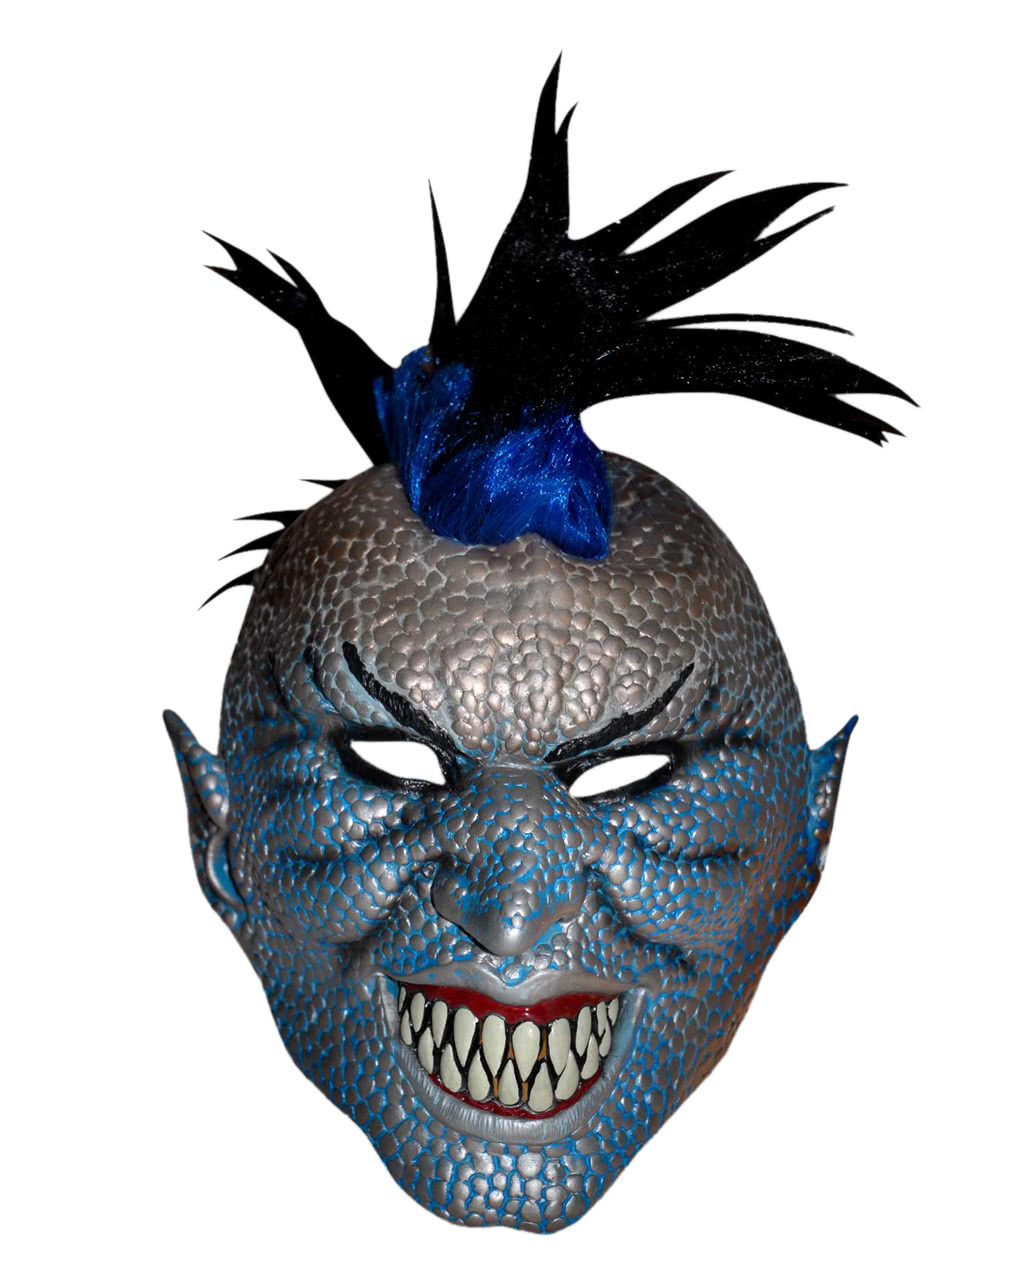 Demon Punk Halloween mask  sc 1 st  Horror-Shop.com & Demon Punk Halloween mask | Horror mask with Mohawk | horror-shop.com